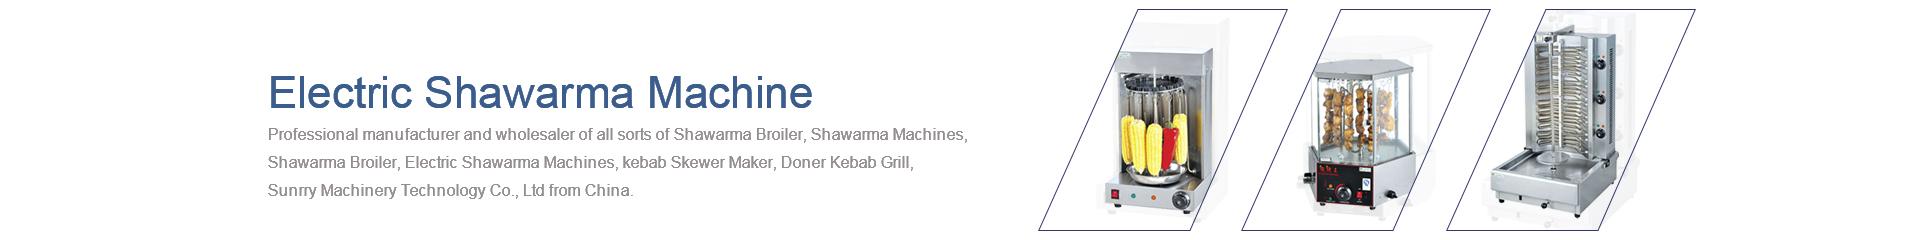 shawarma machine price